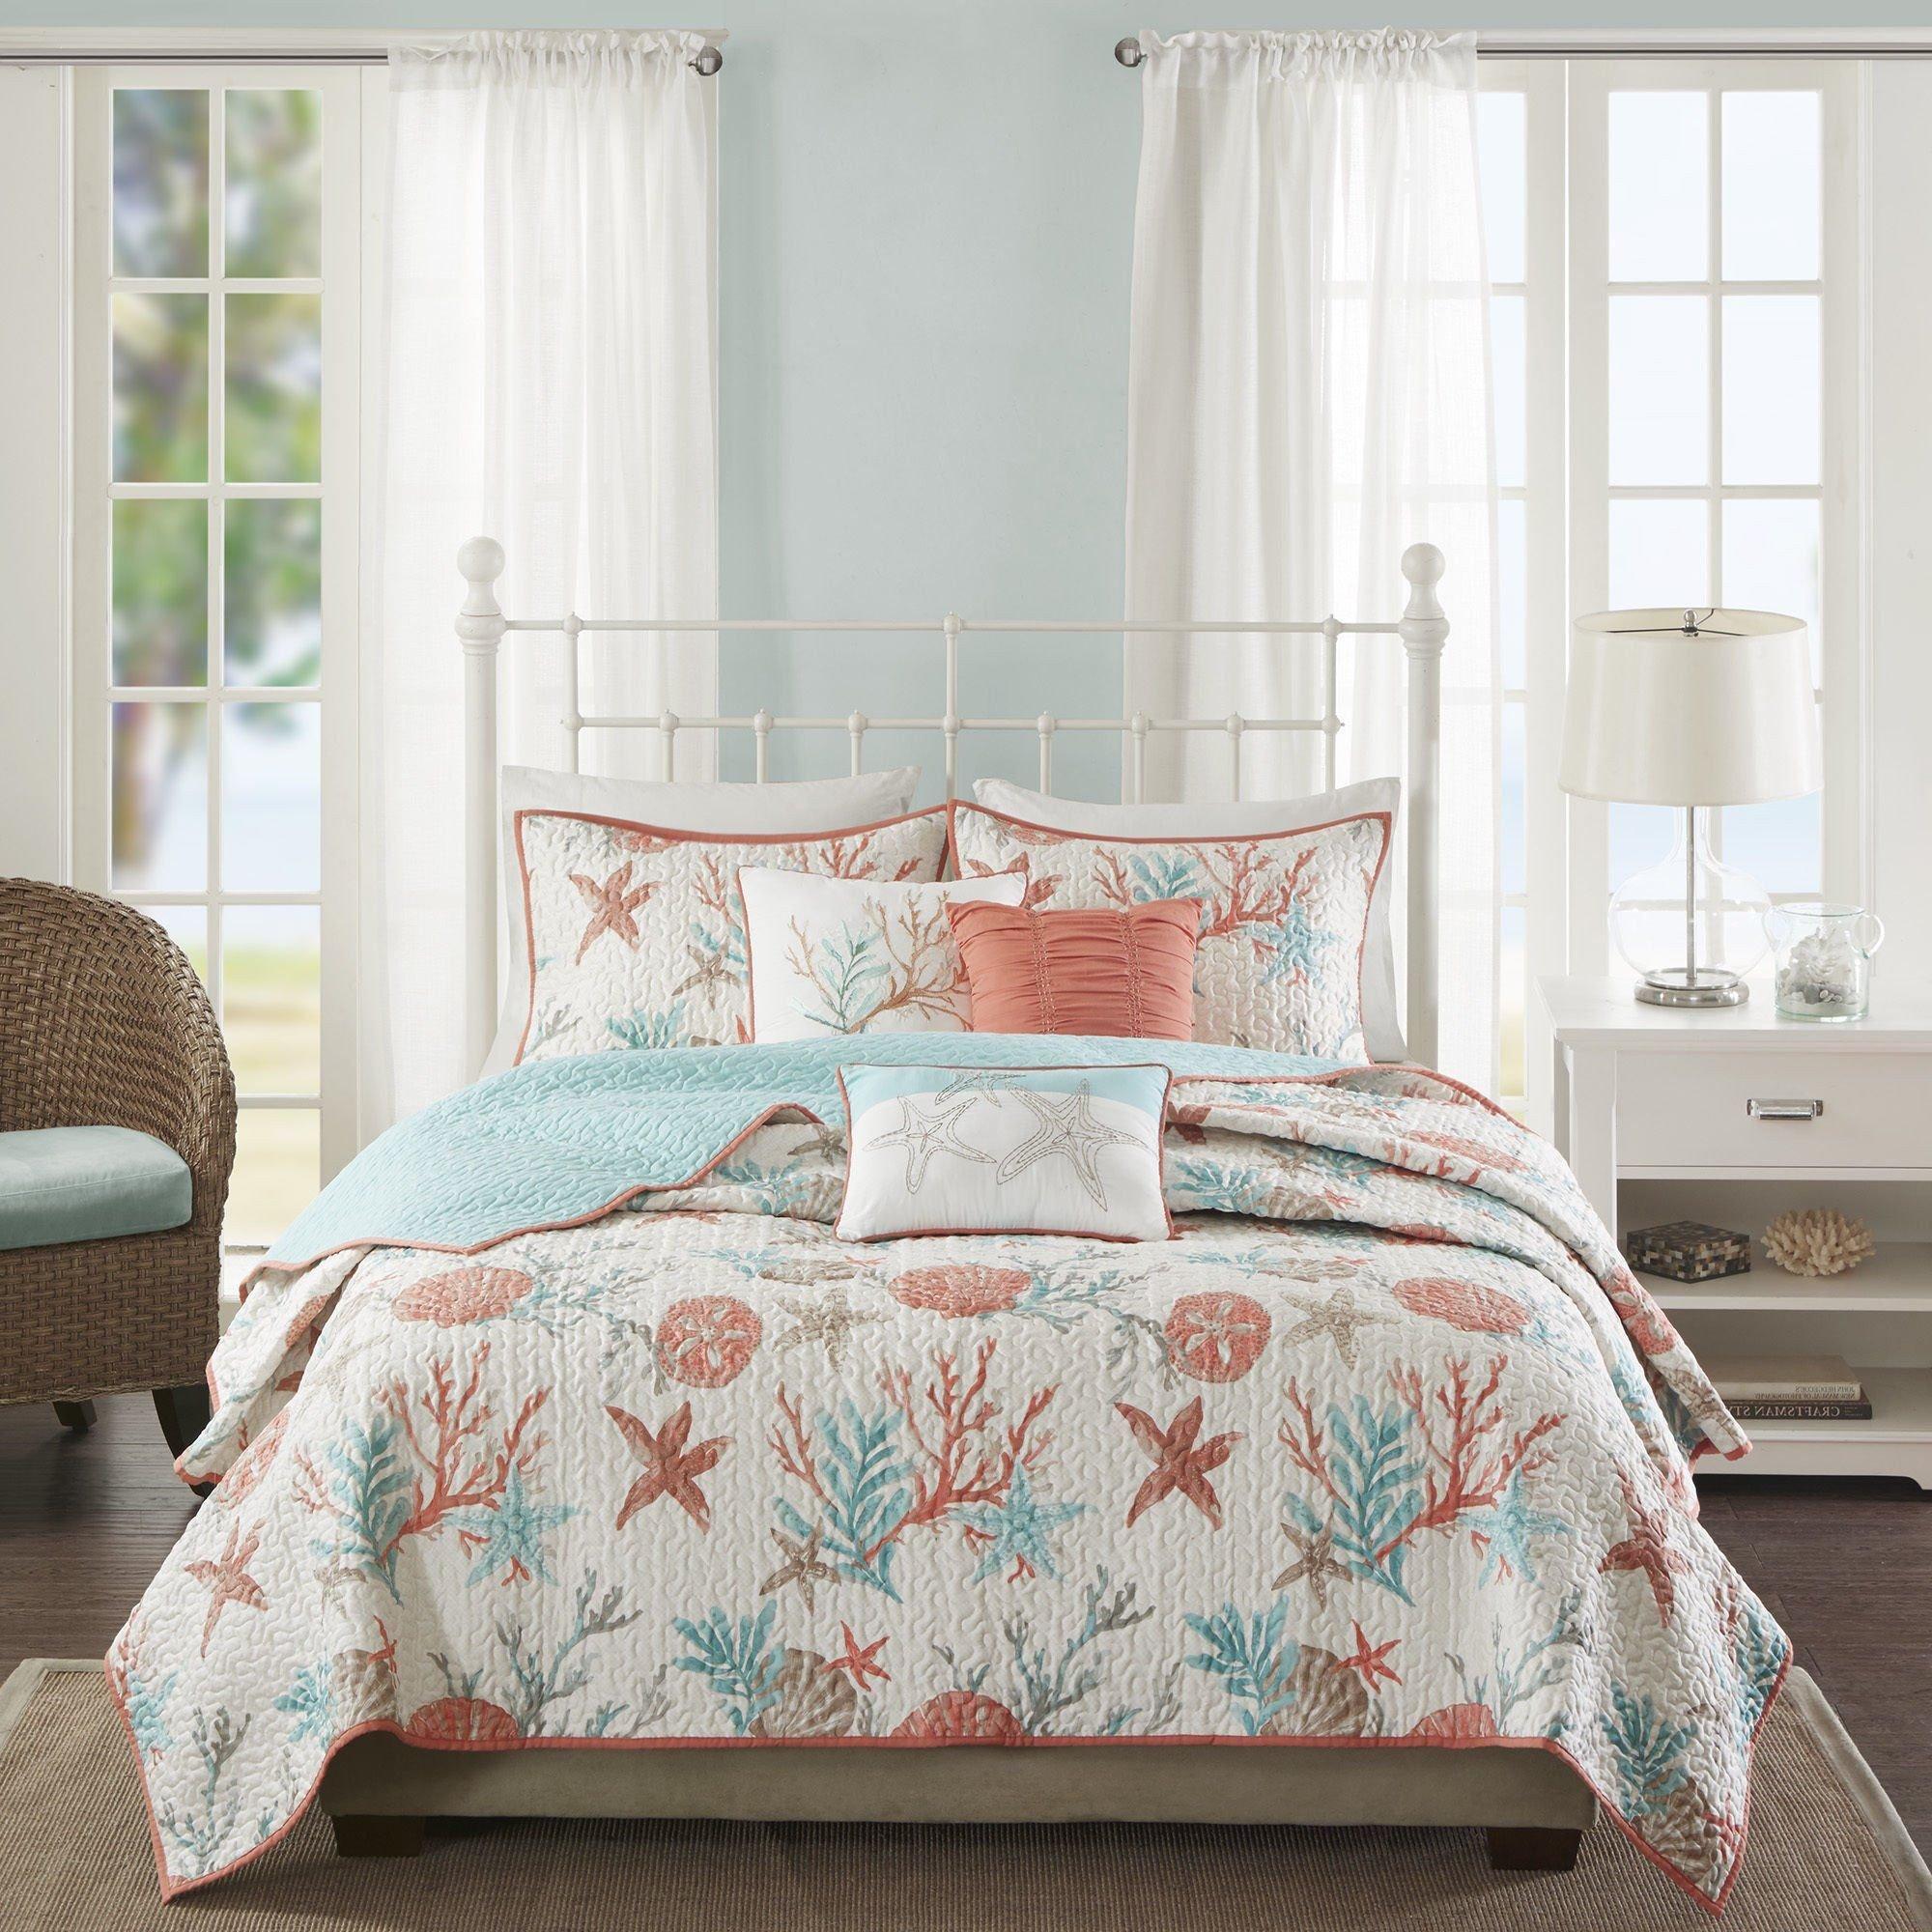 Beach themed Bedroom Accessories Luxury 6 Piece Vibrant orange Pink Blue White Full Queen Quilt Set